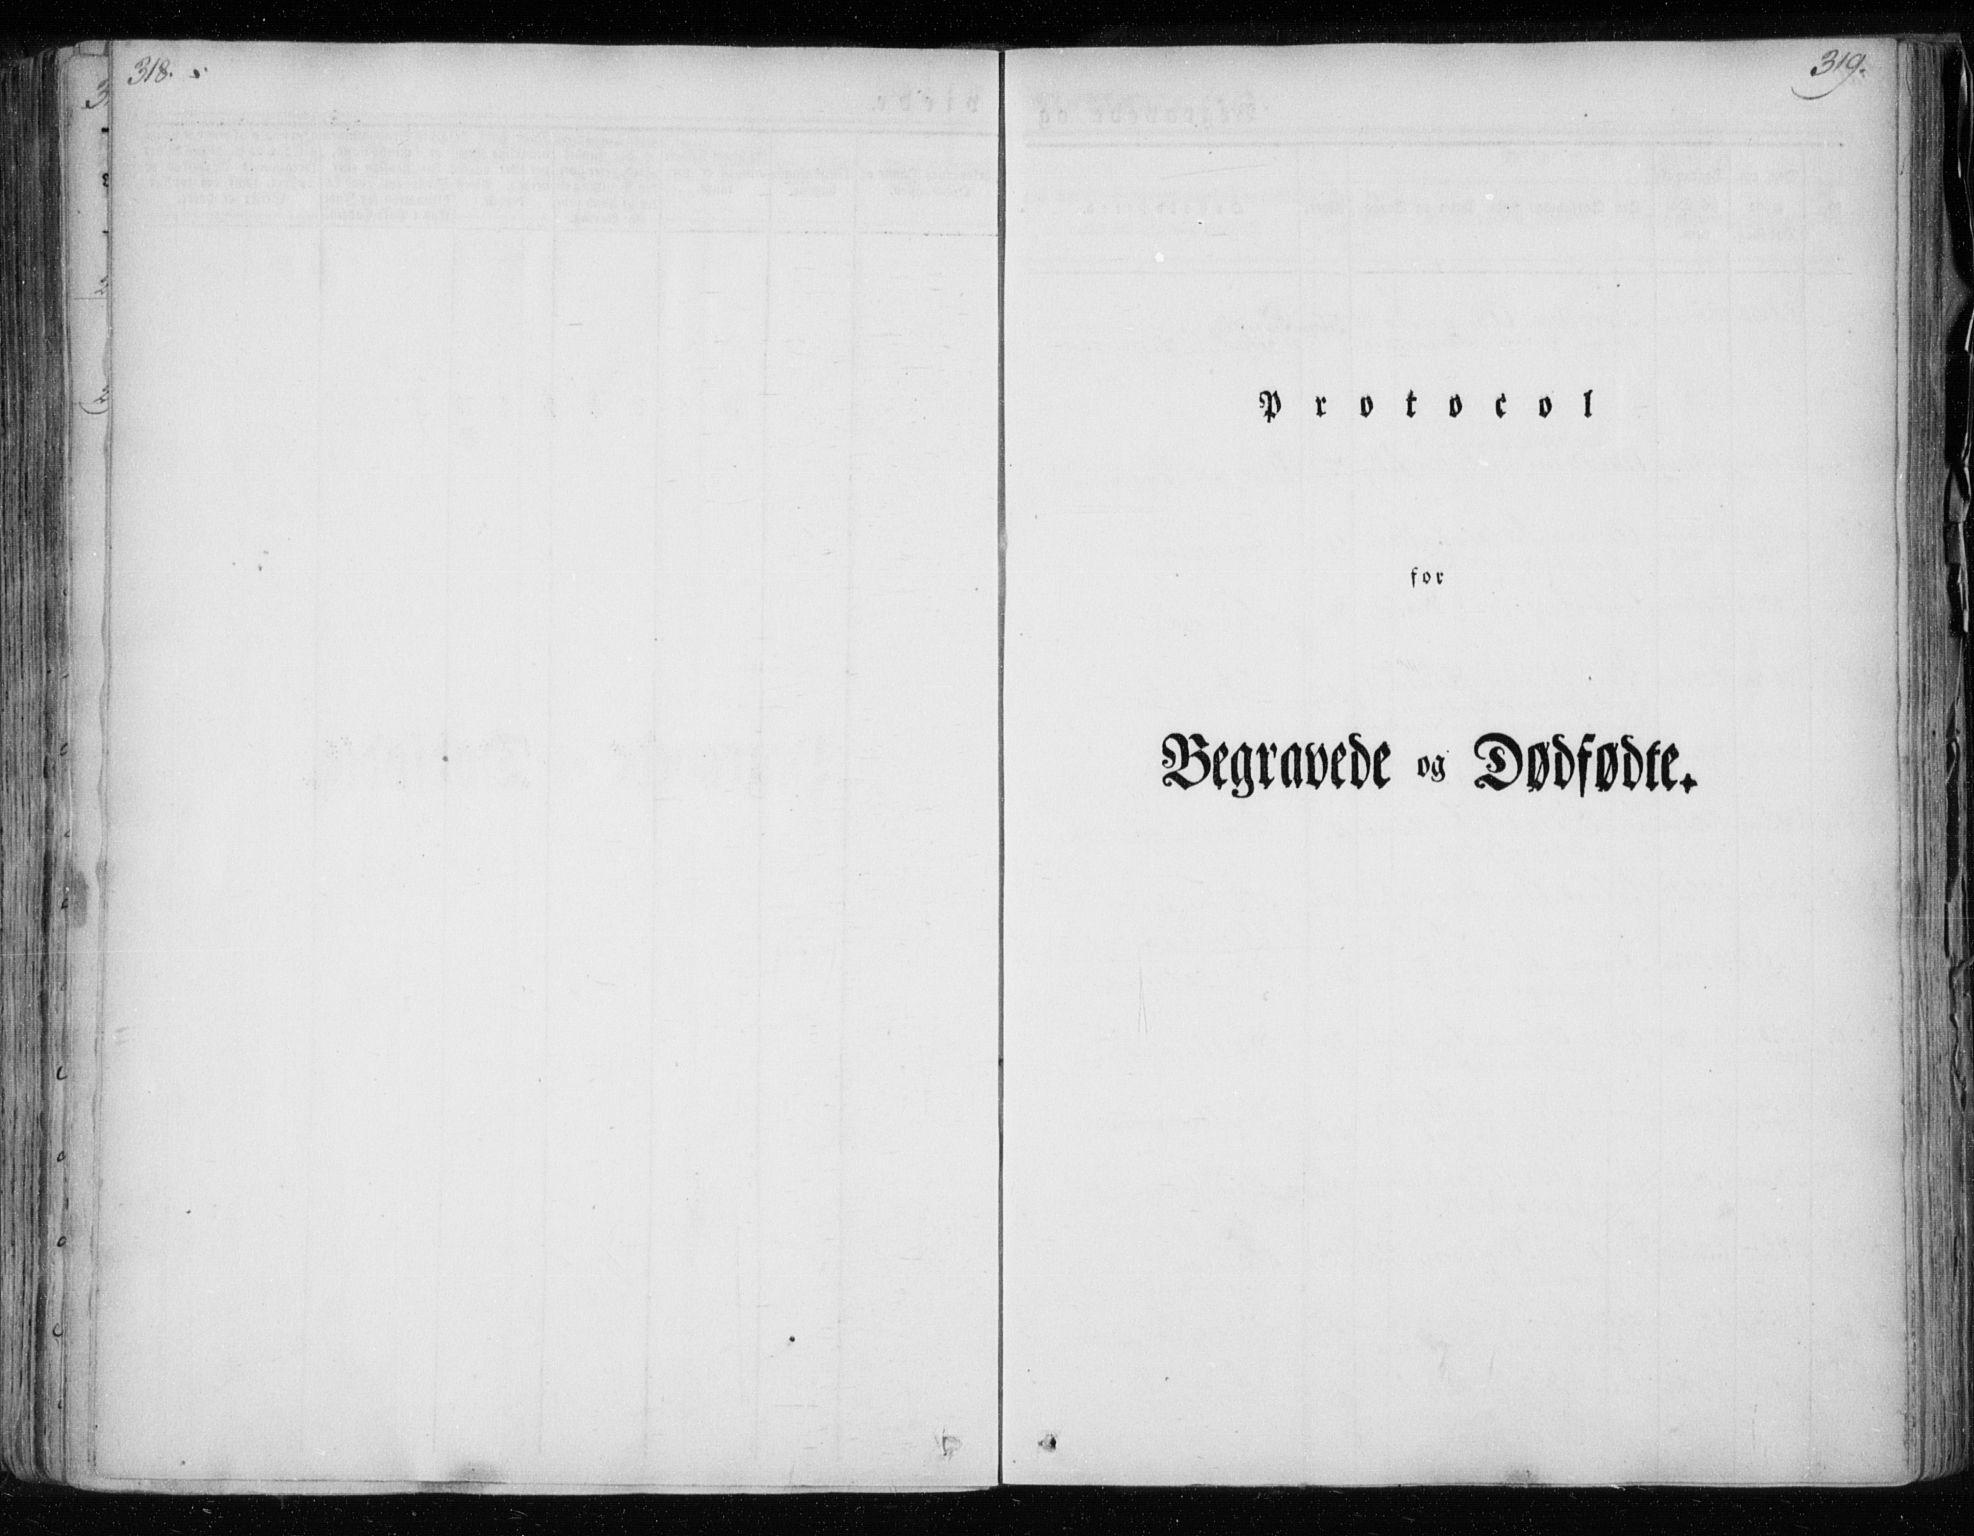 SAT, Ministerialprotokoller, klokkerbøker og fødselsregistre - Nordland, 825/L0354: Ministerialbok nr. 825A08, 1826-1841, s. 318-319